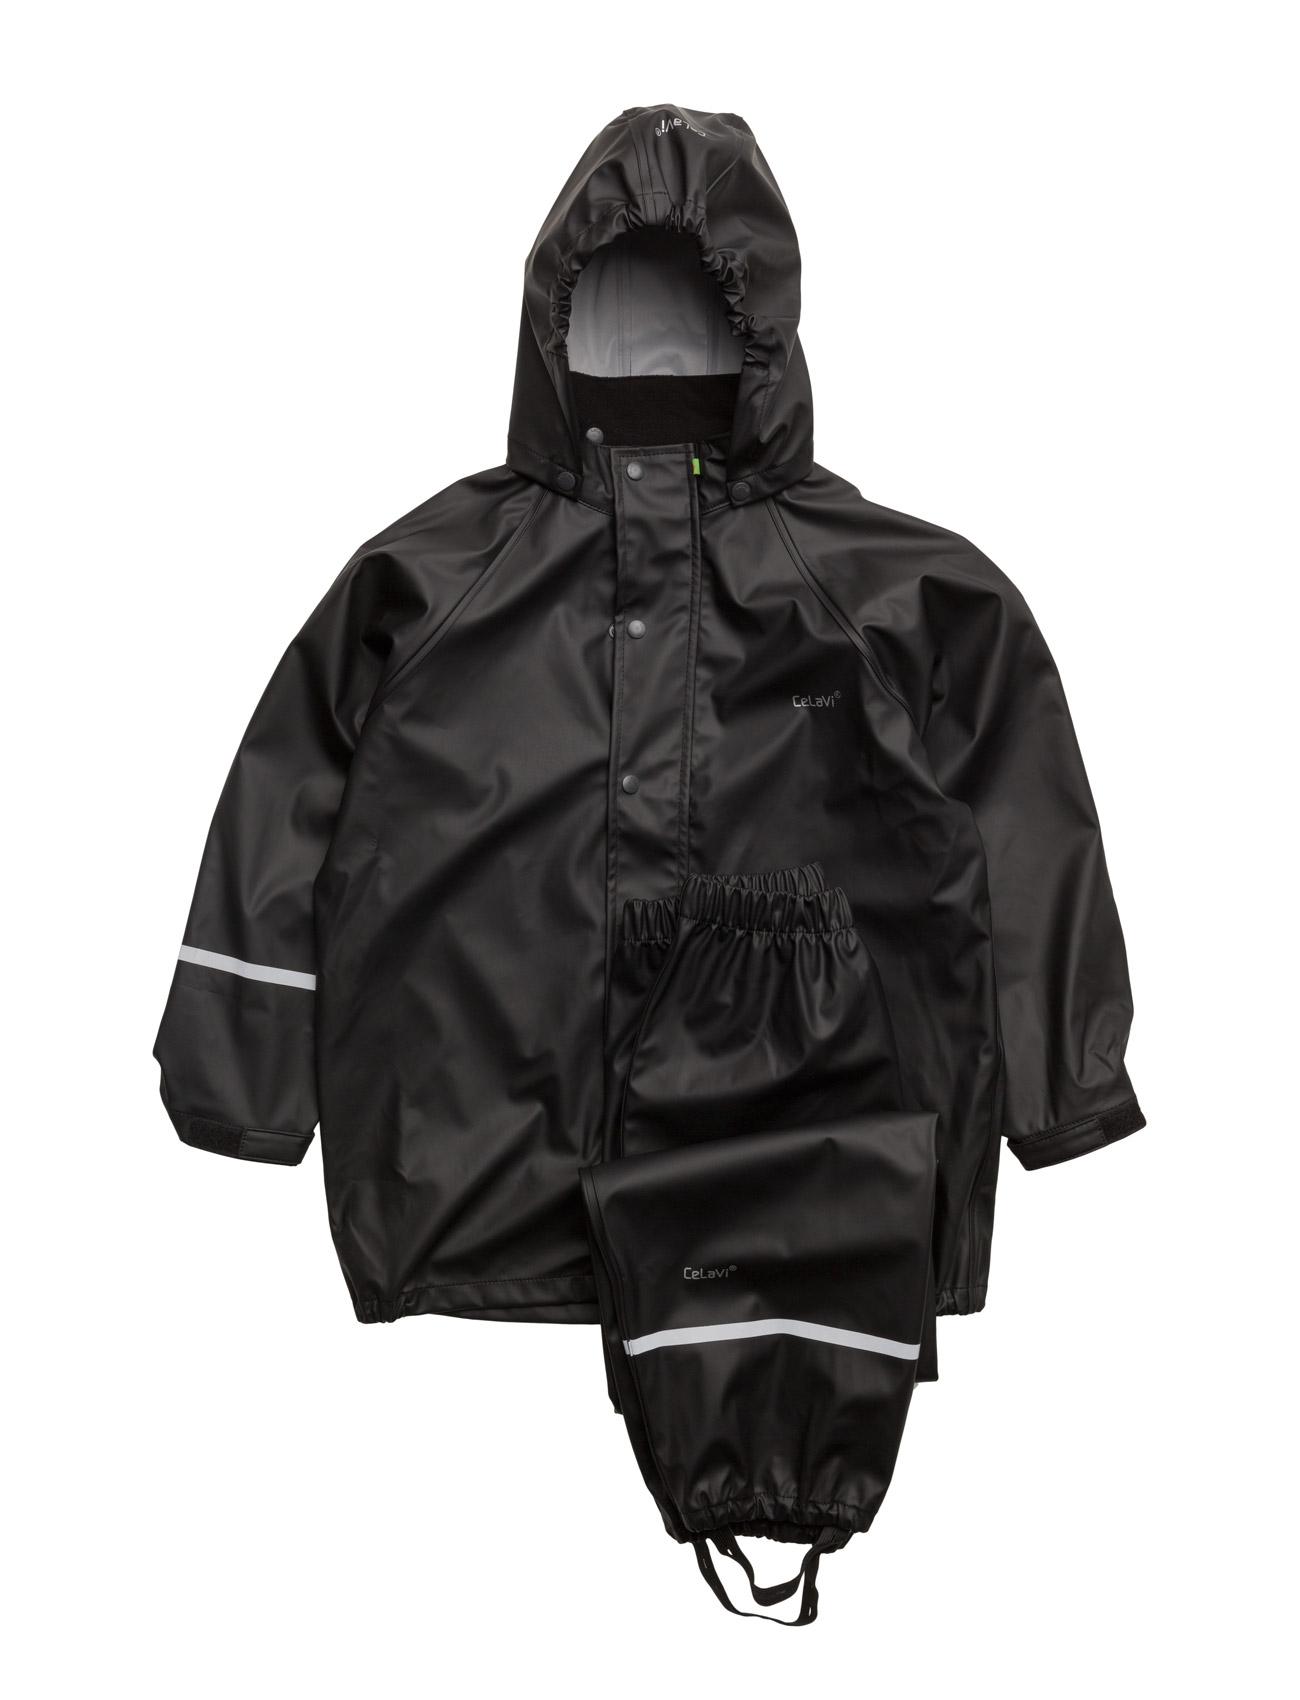 CeLaVi Basic rainsuit, PU